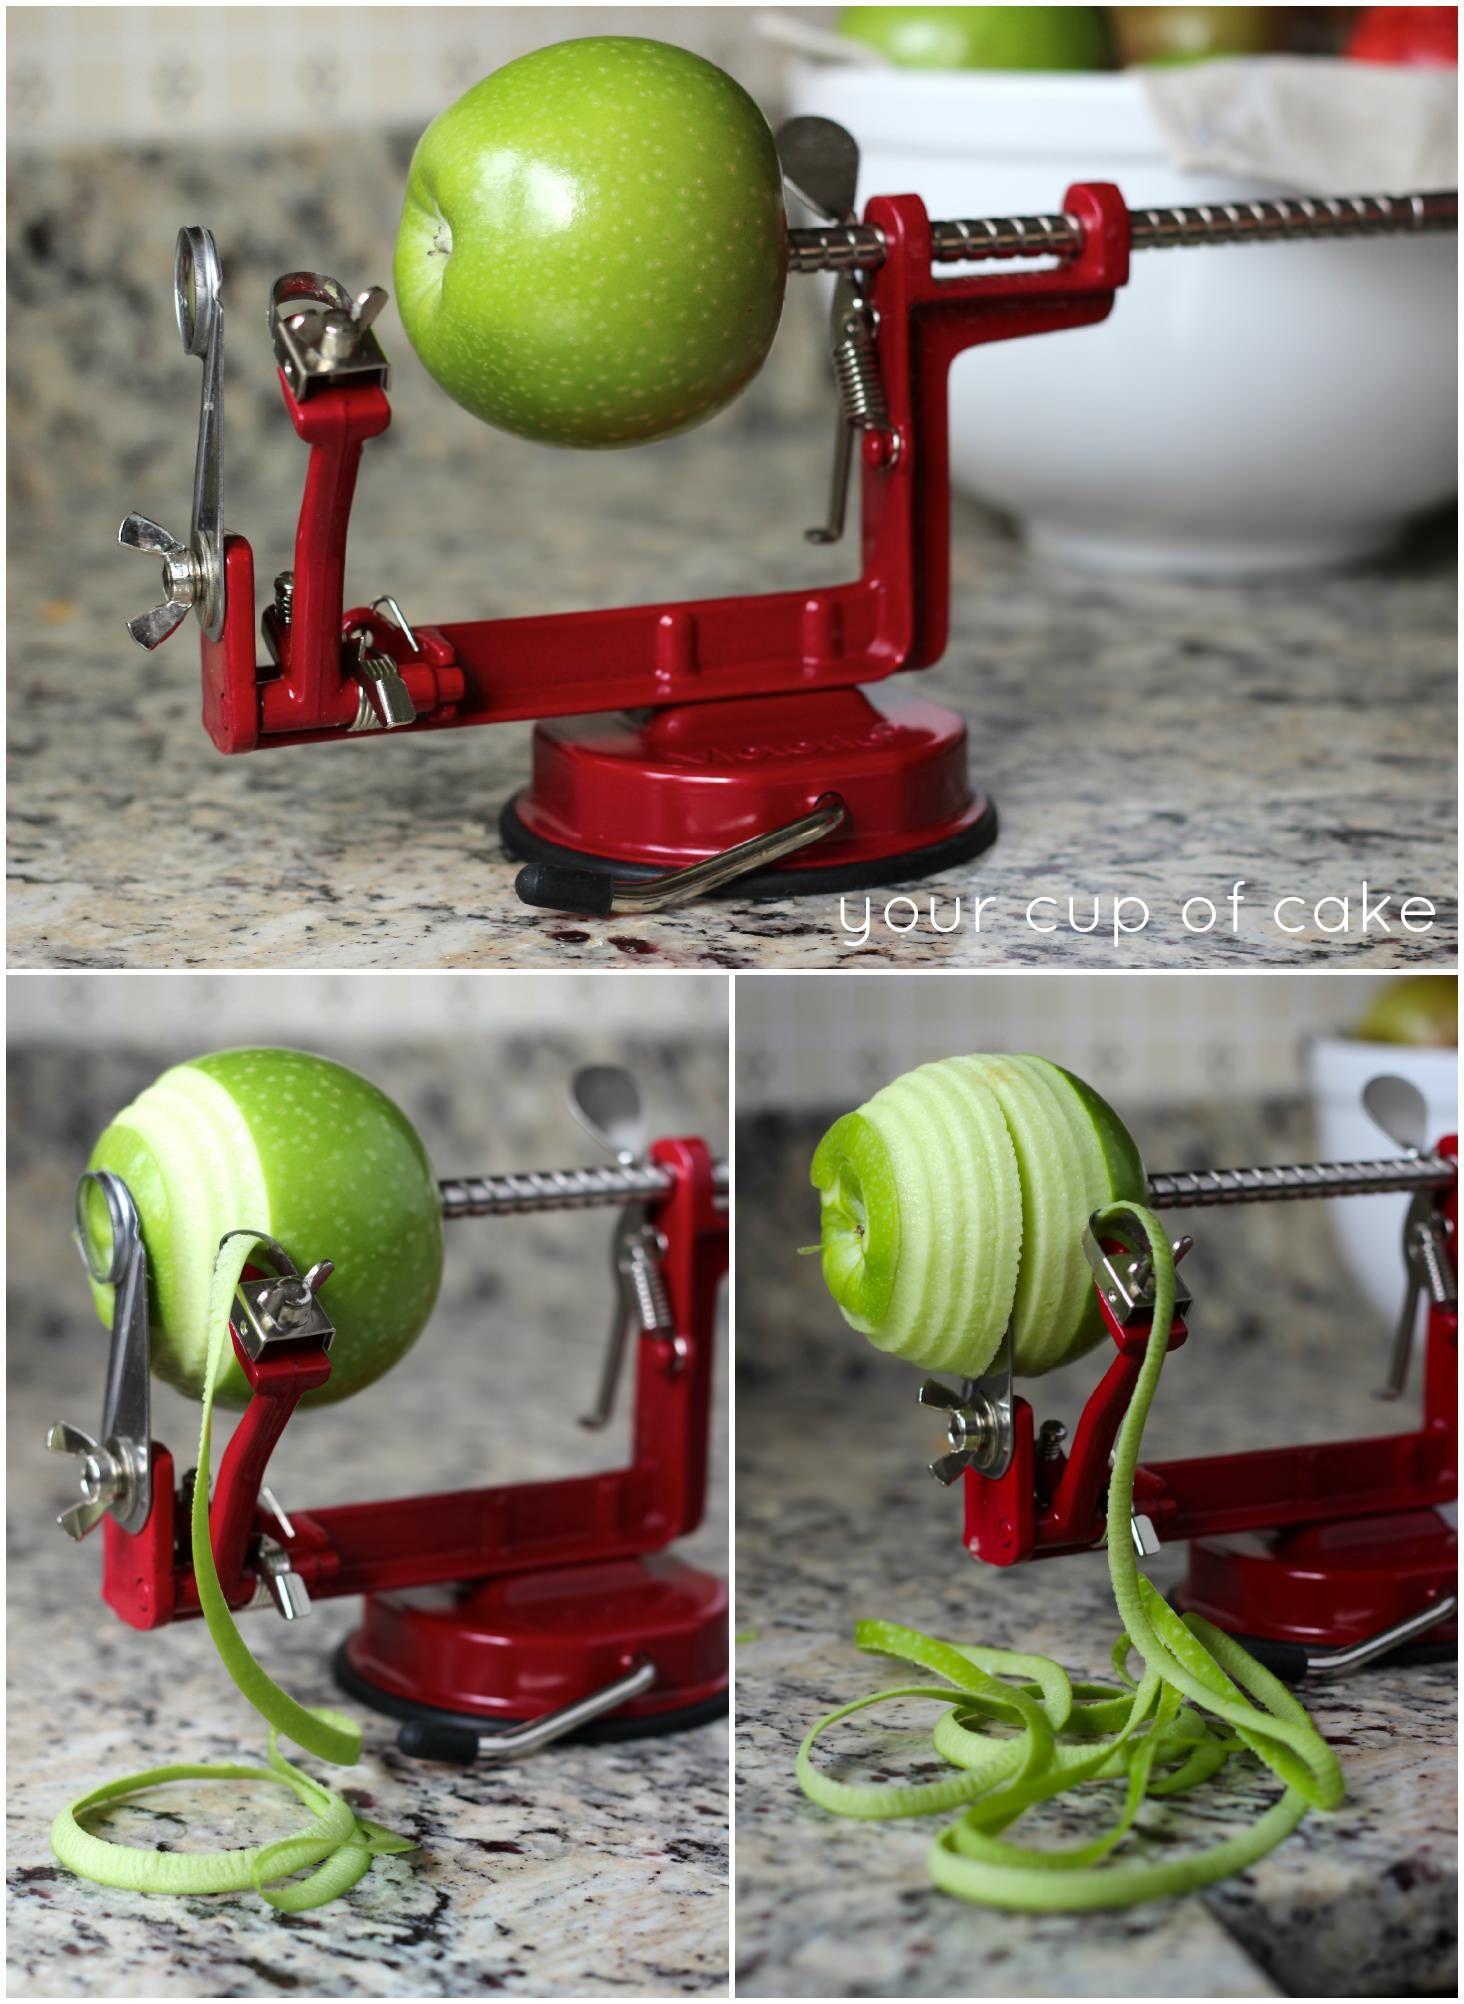 Apple peeler and corer caramel apples pie peeling potatoes